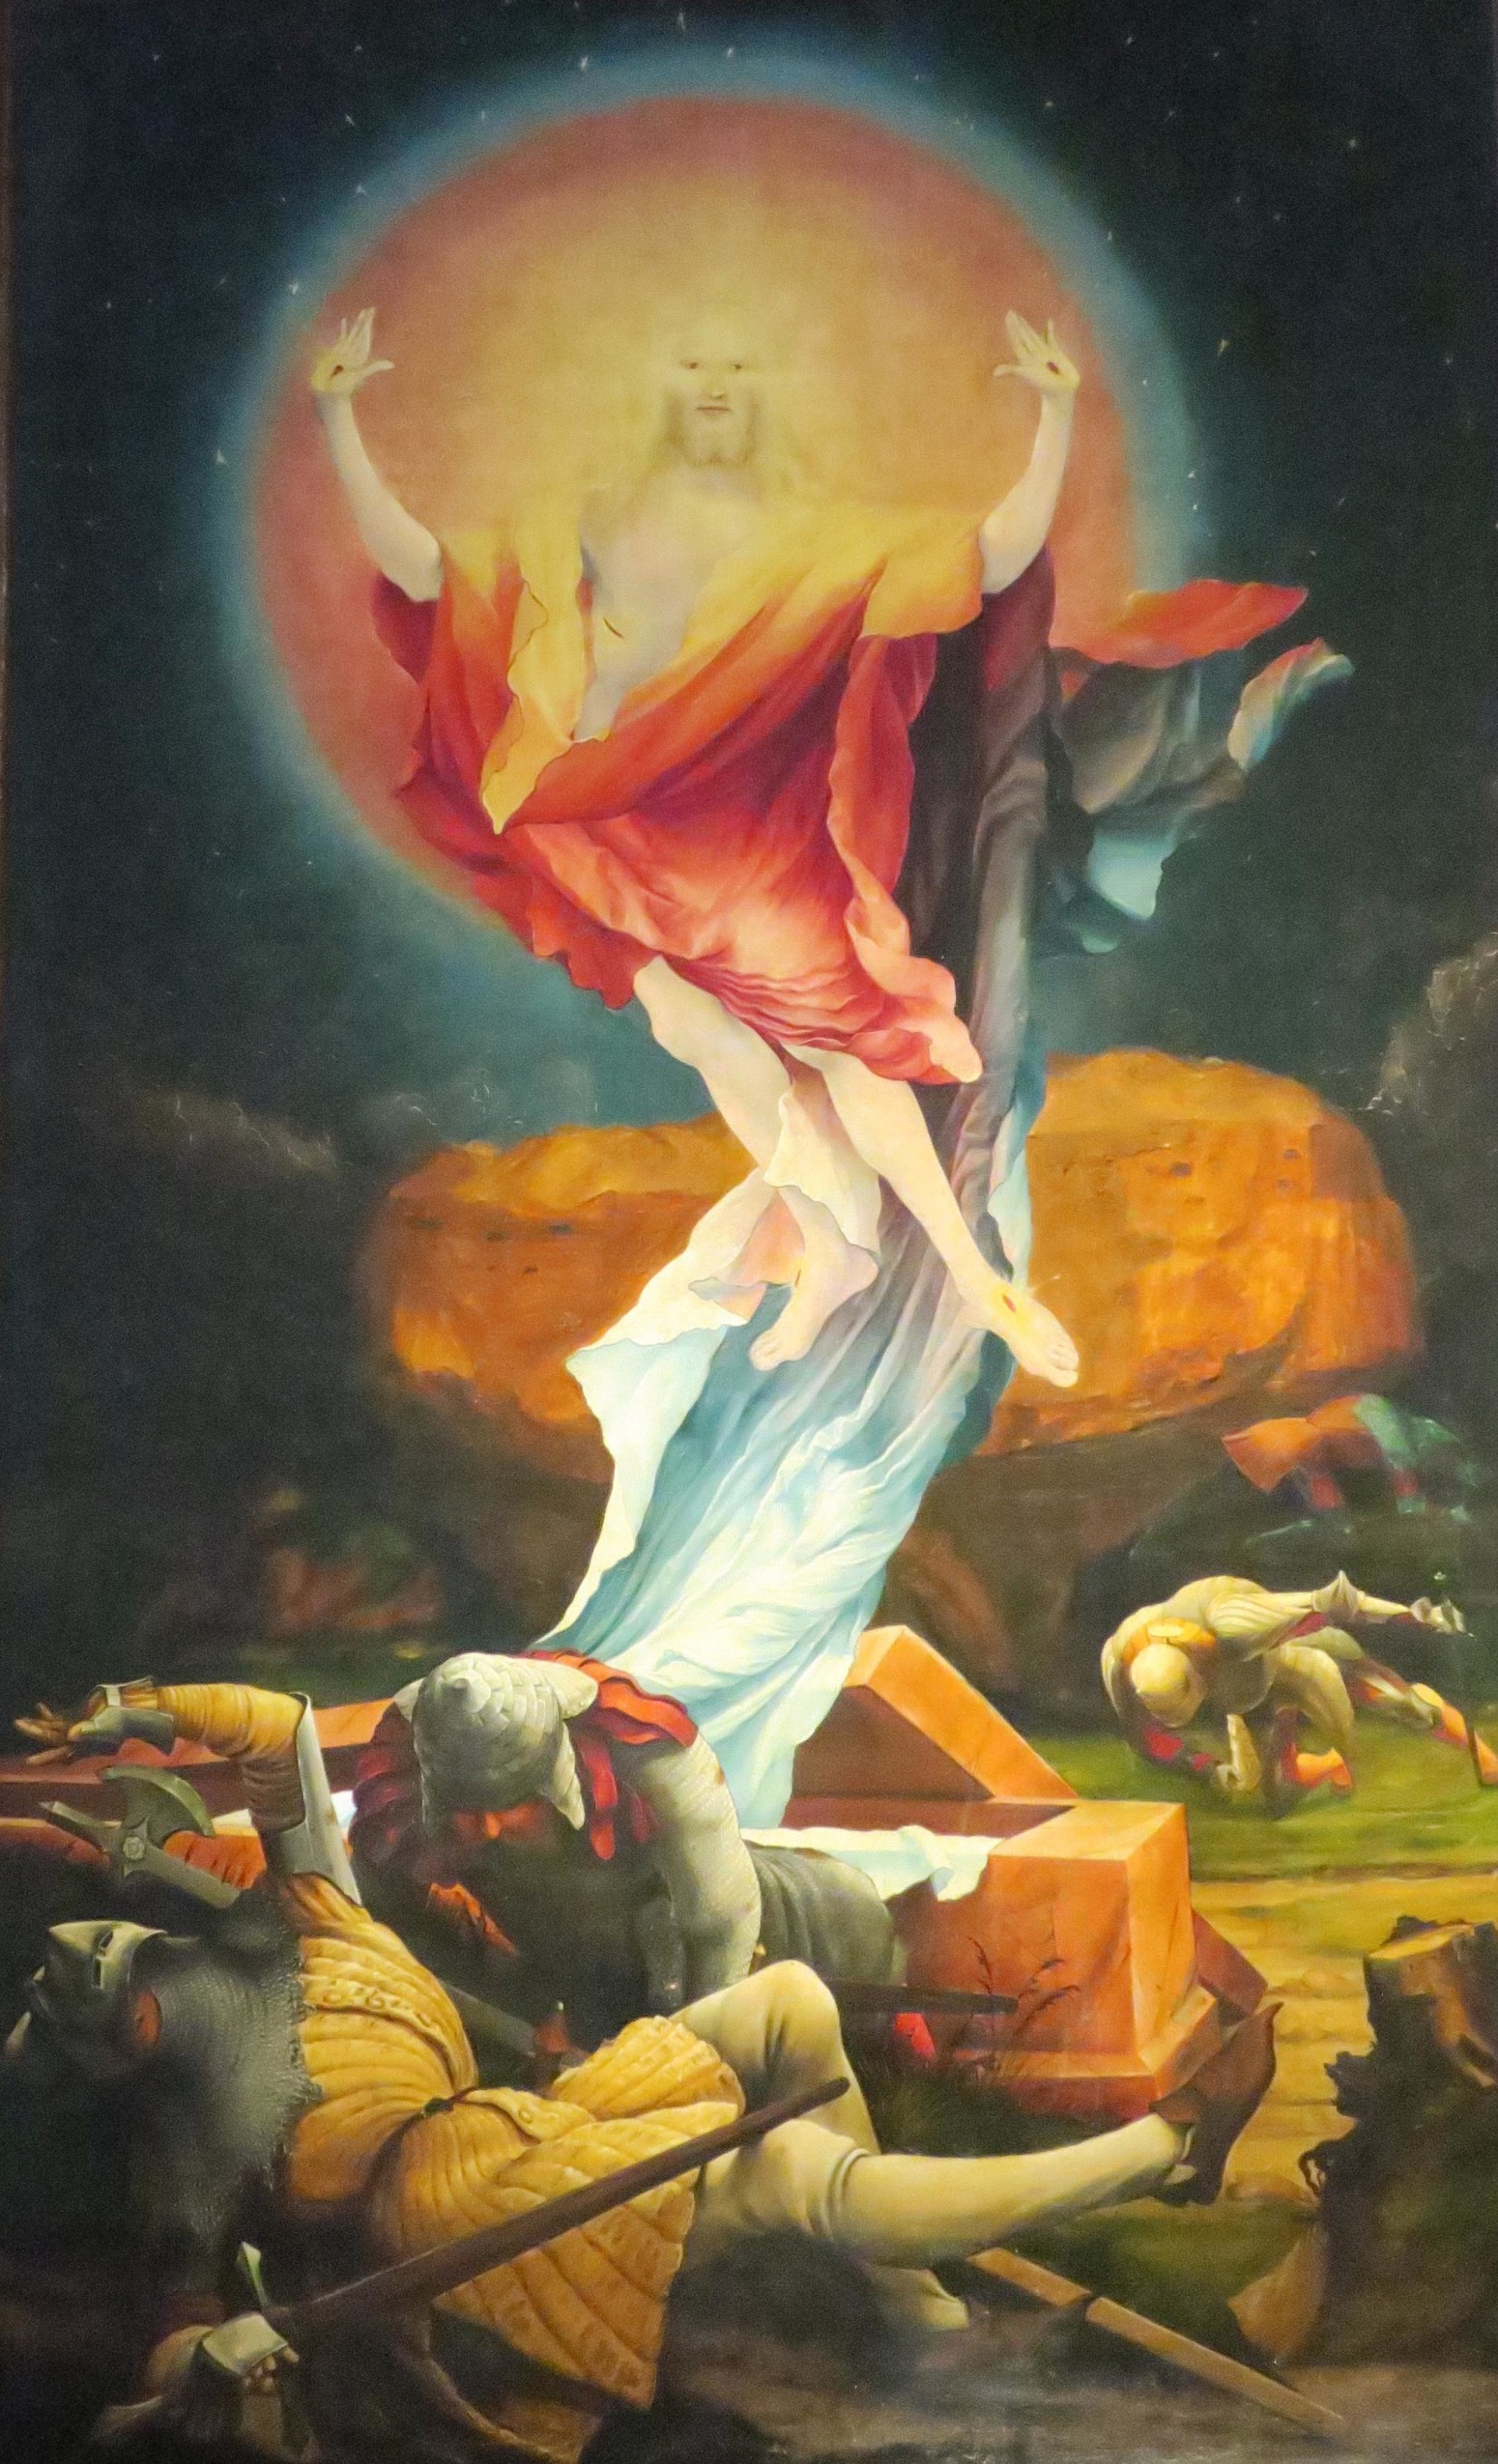 Matthias Grünewald, La Resurrezione, Altare di Isenheim, Musée d'Unterlinden, Colmar, Francia